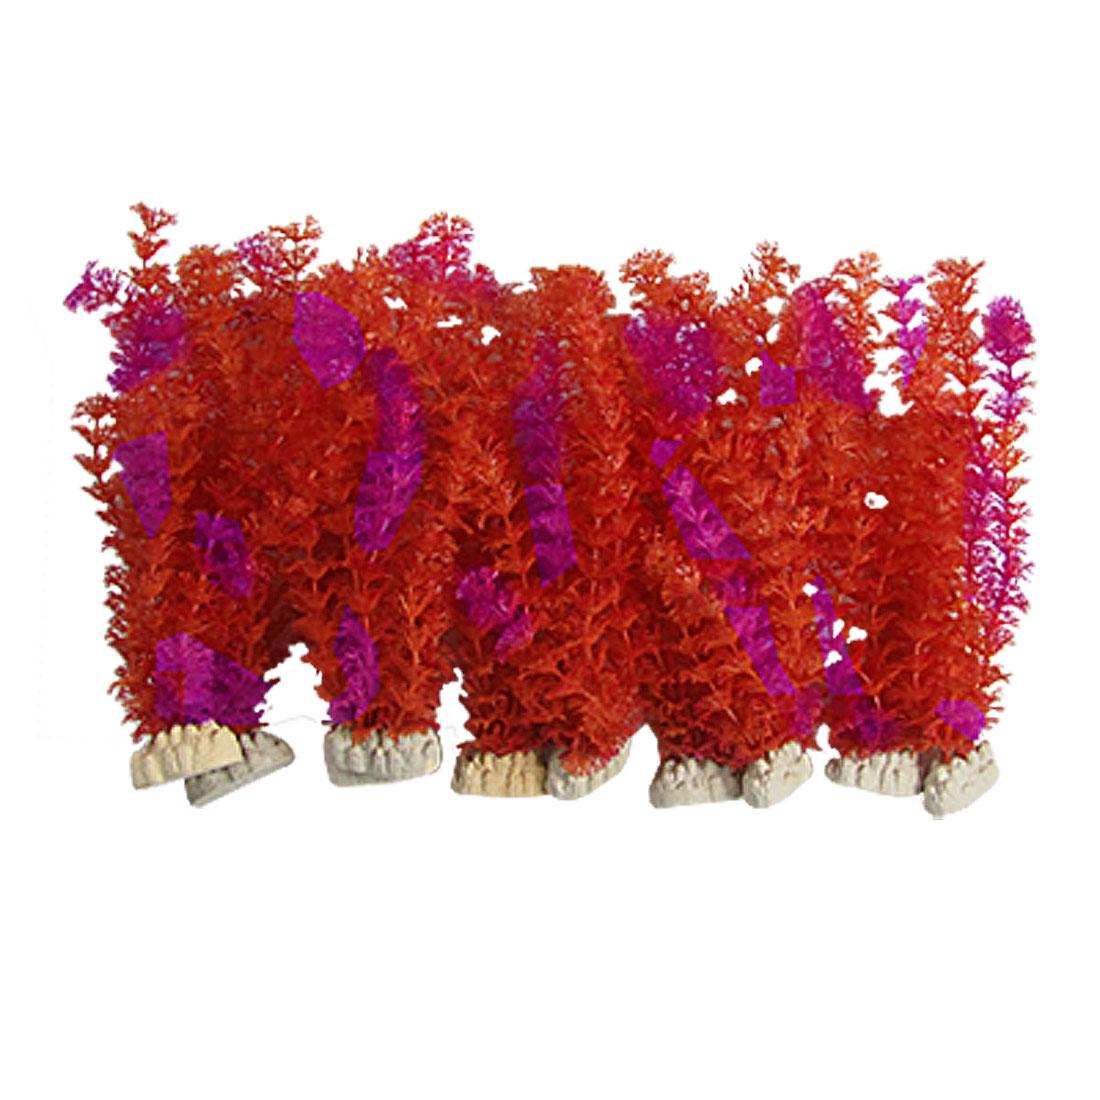 "10PCS 11"" Long Magenta Red Plastic Grass Decor with Base for Aquarium"